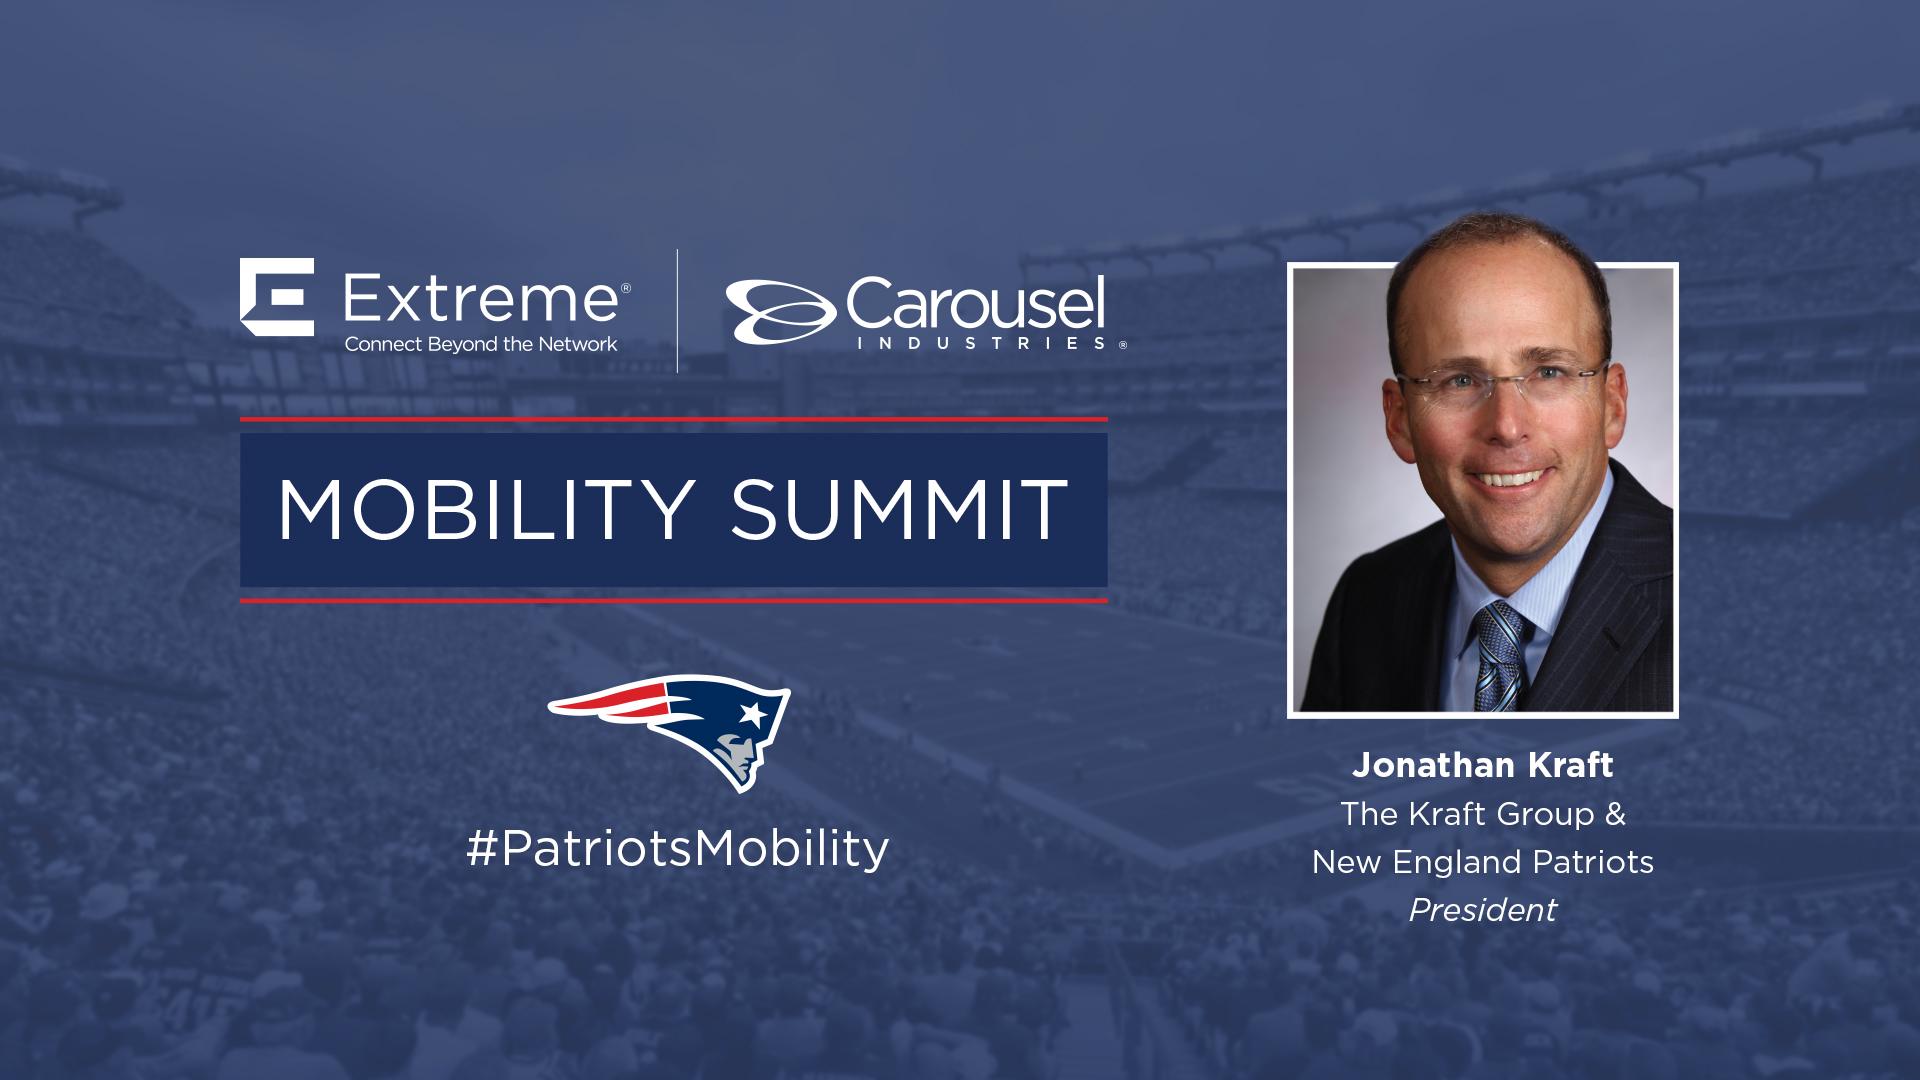 Patriots-Mobility-Summit_Club-Monitor-Jonathan-Kraft